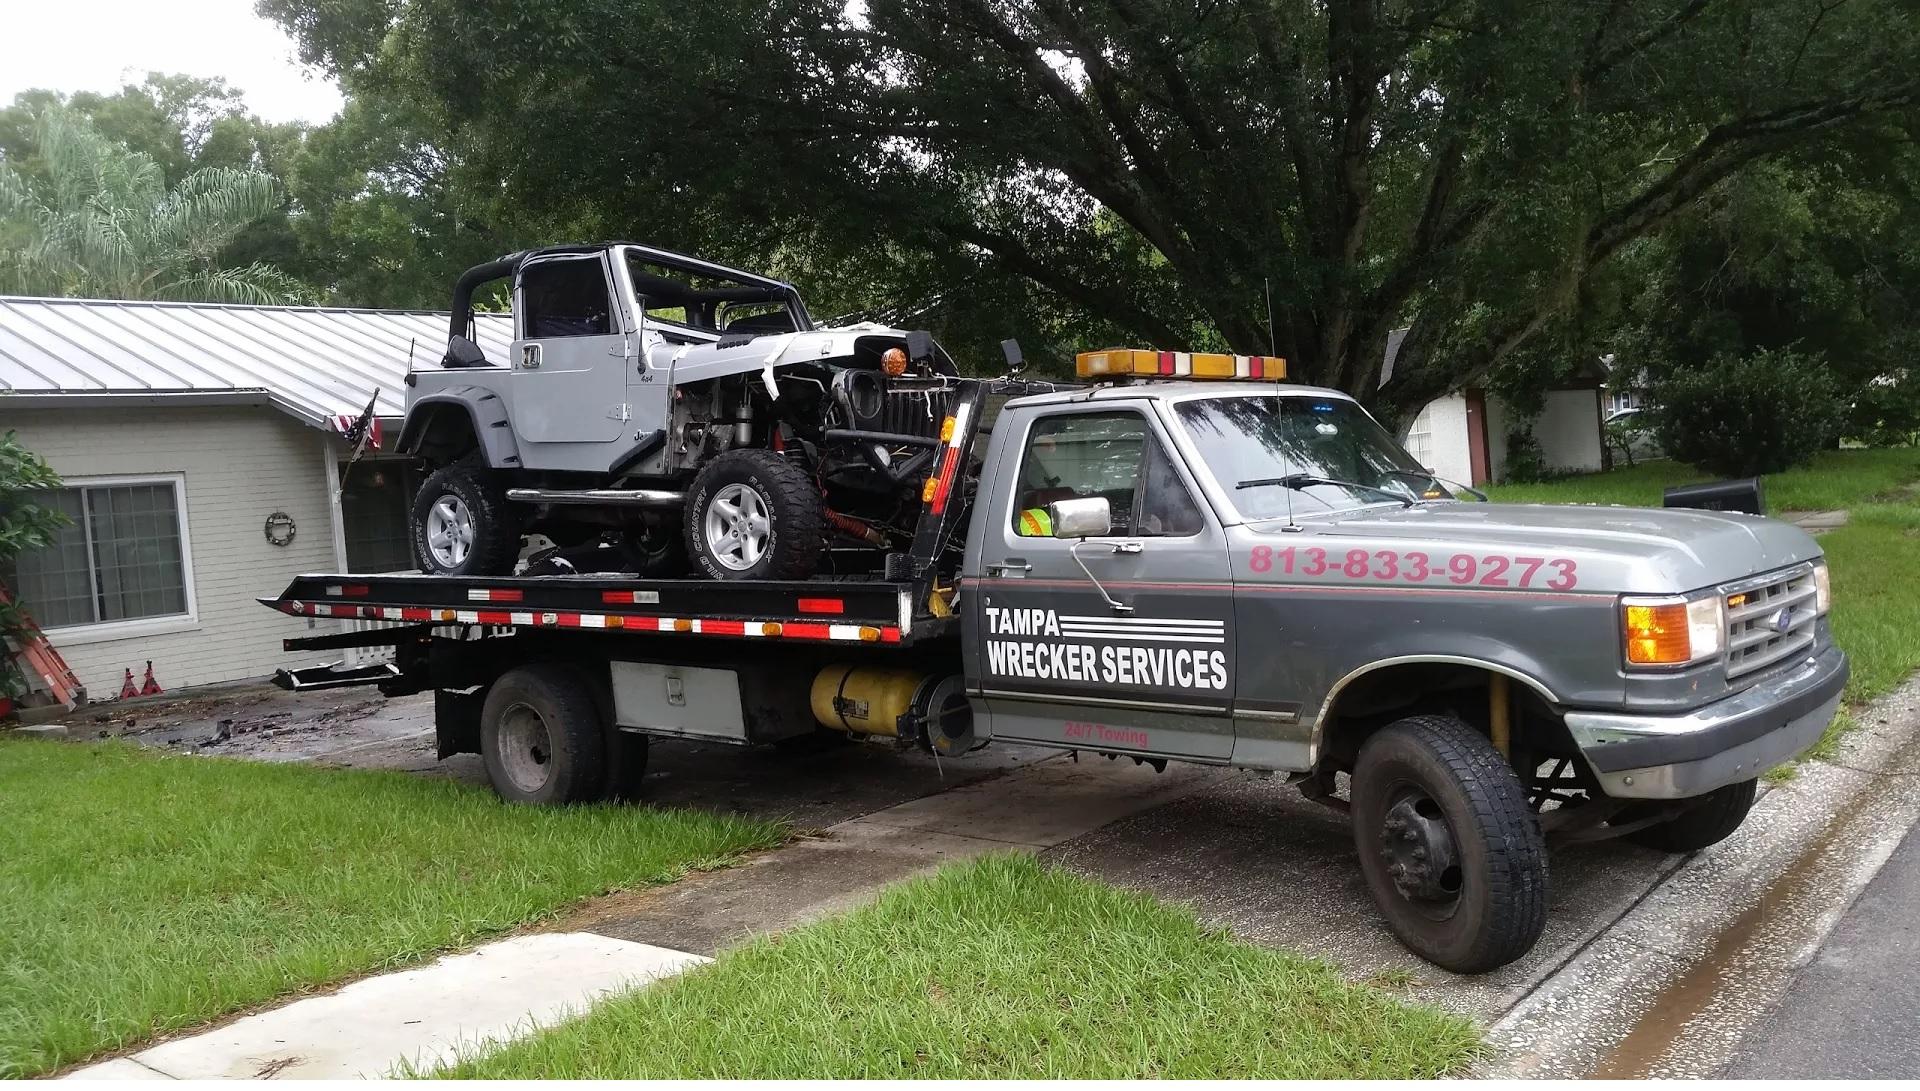 2003 Jeep Wrangler, unspeakable.